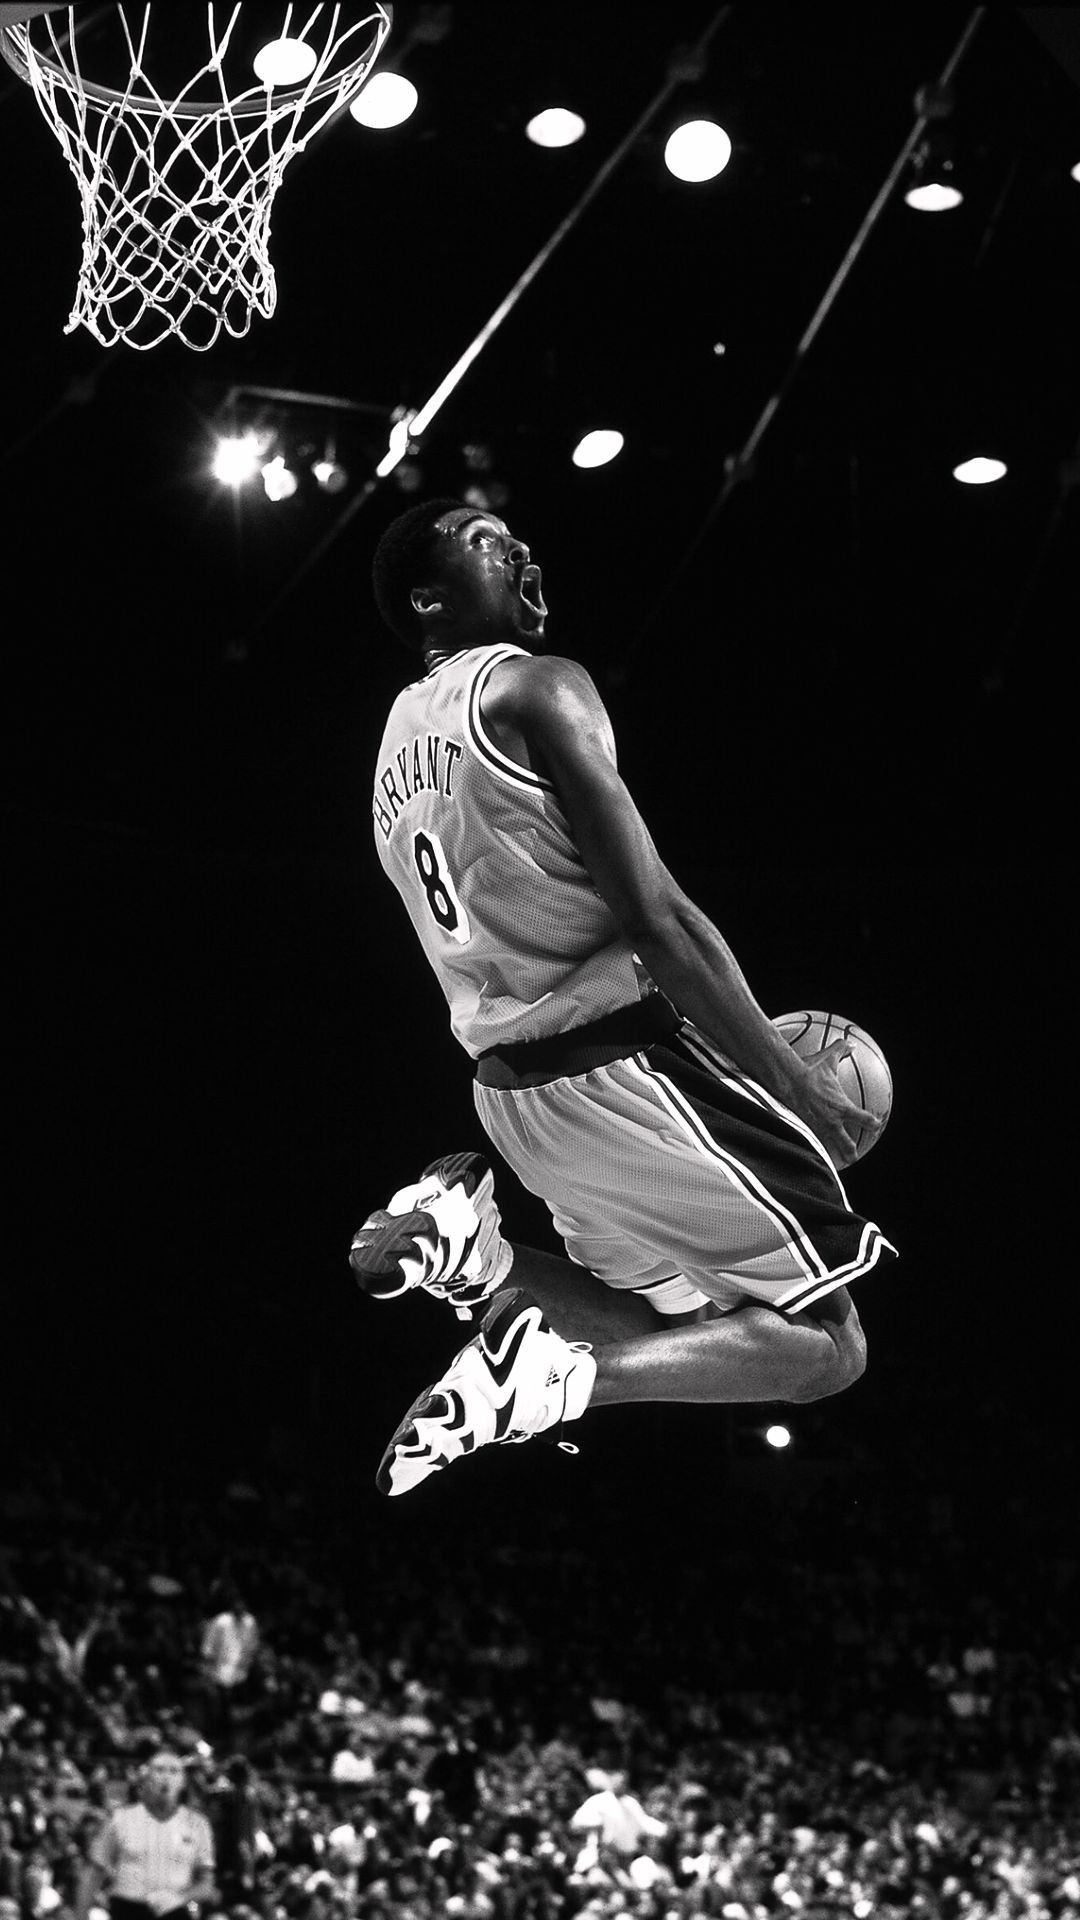 Kobe Bryant Hd Basketball Wallpaper Kobe Bryant Pictures Basketball Wallpaper Kobe Bryant Poster Kobe bryant black and white wallpaper